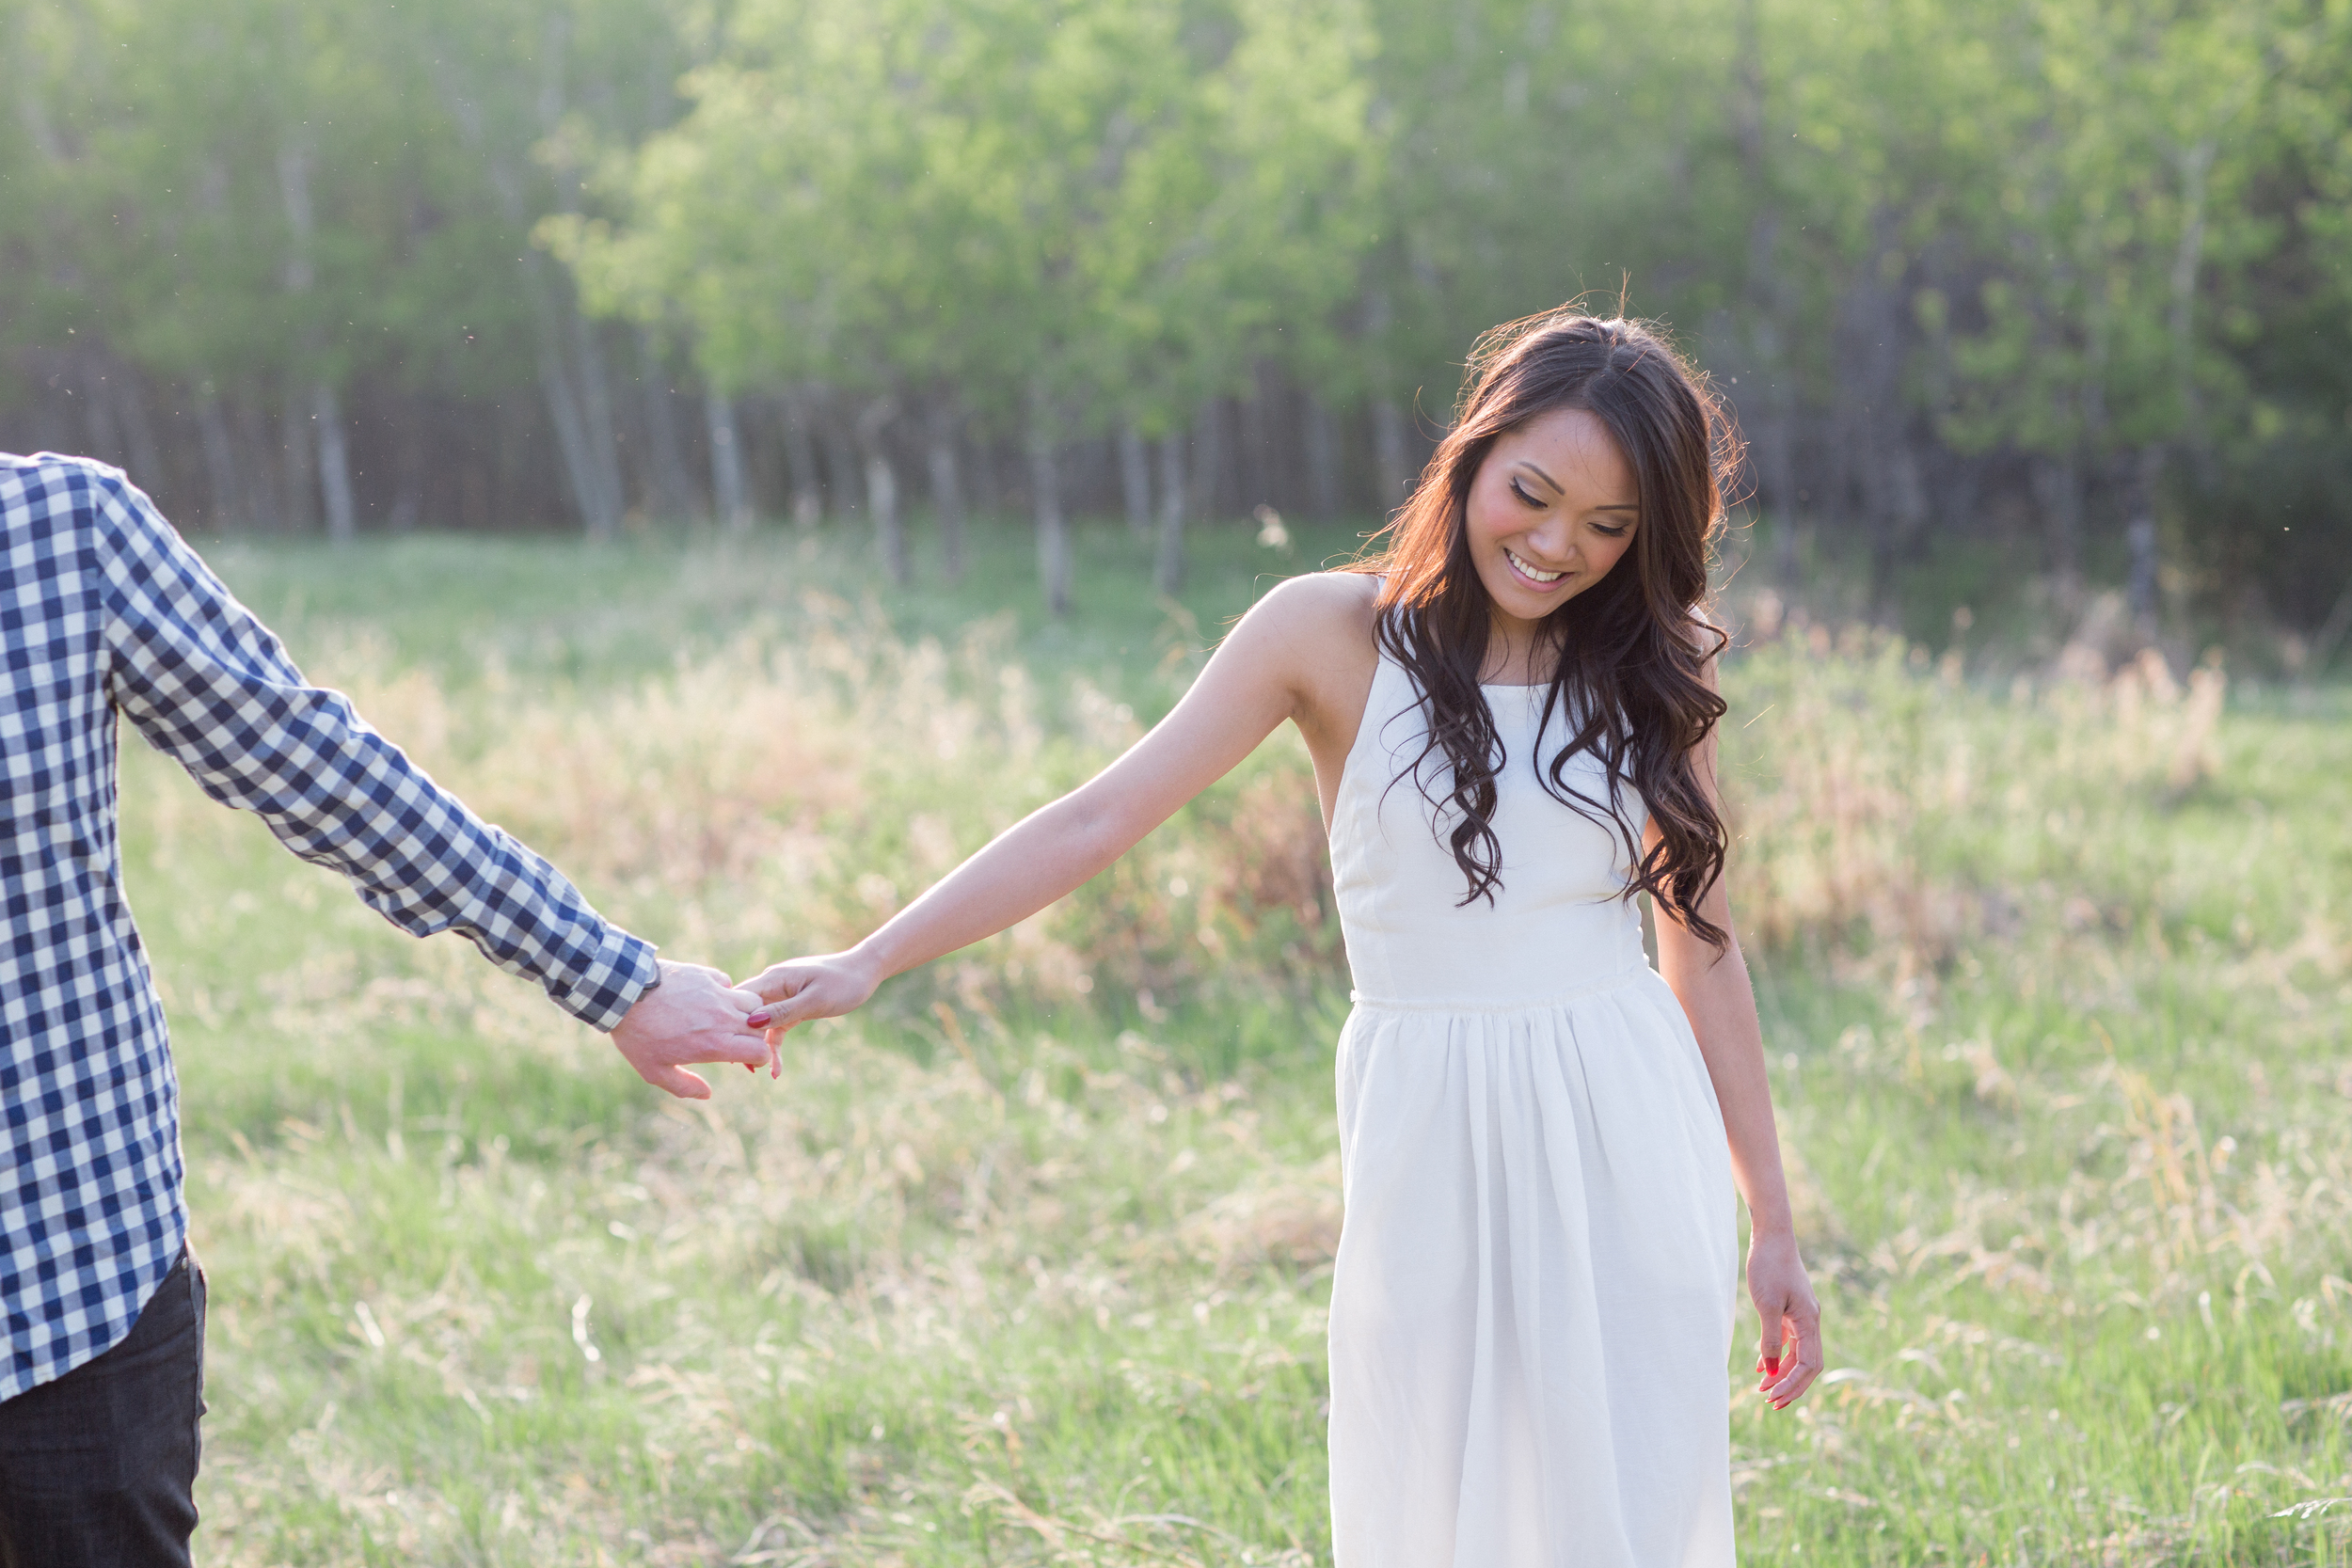 EngagementPhotography_ParrishHousePhotos_StefanieShawn_30.jpg